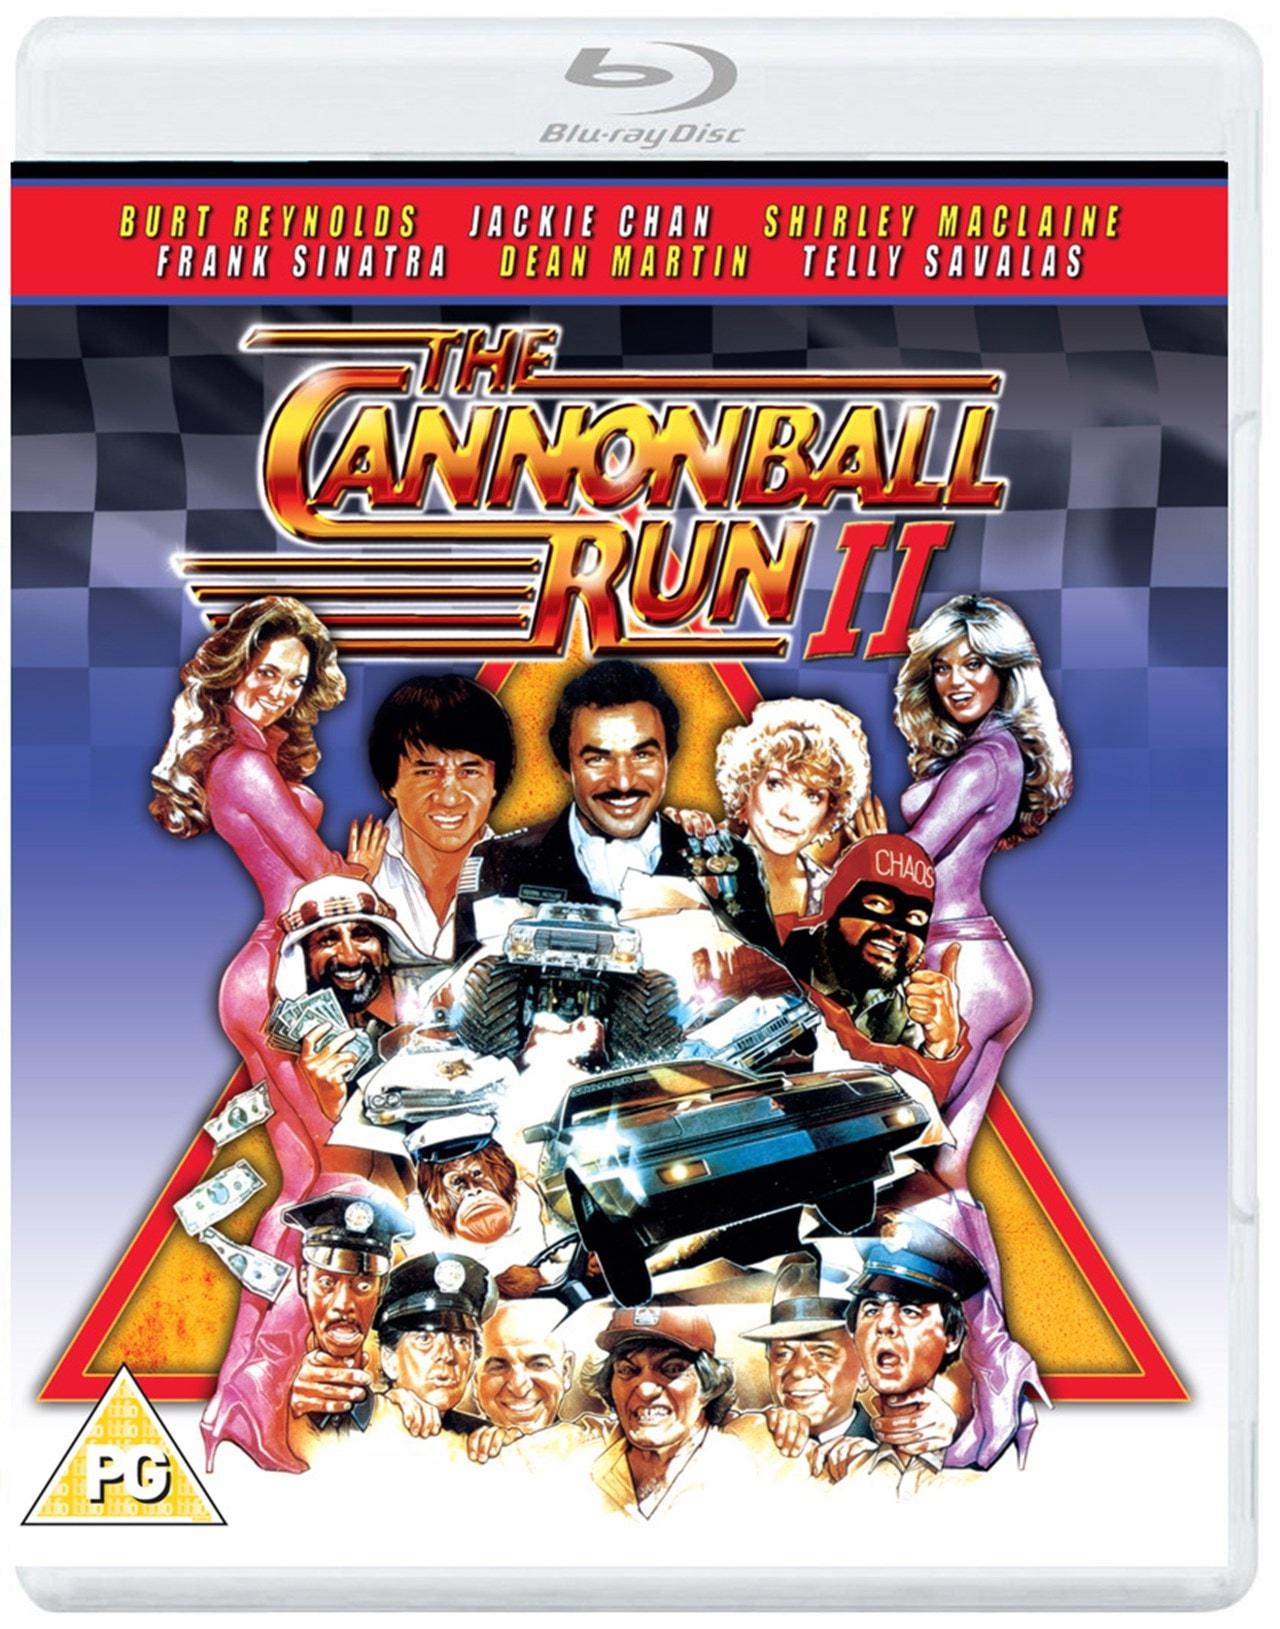 Cannonball Run 2 - 1